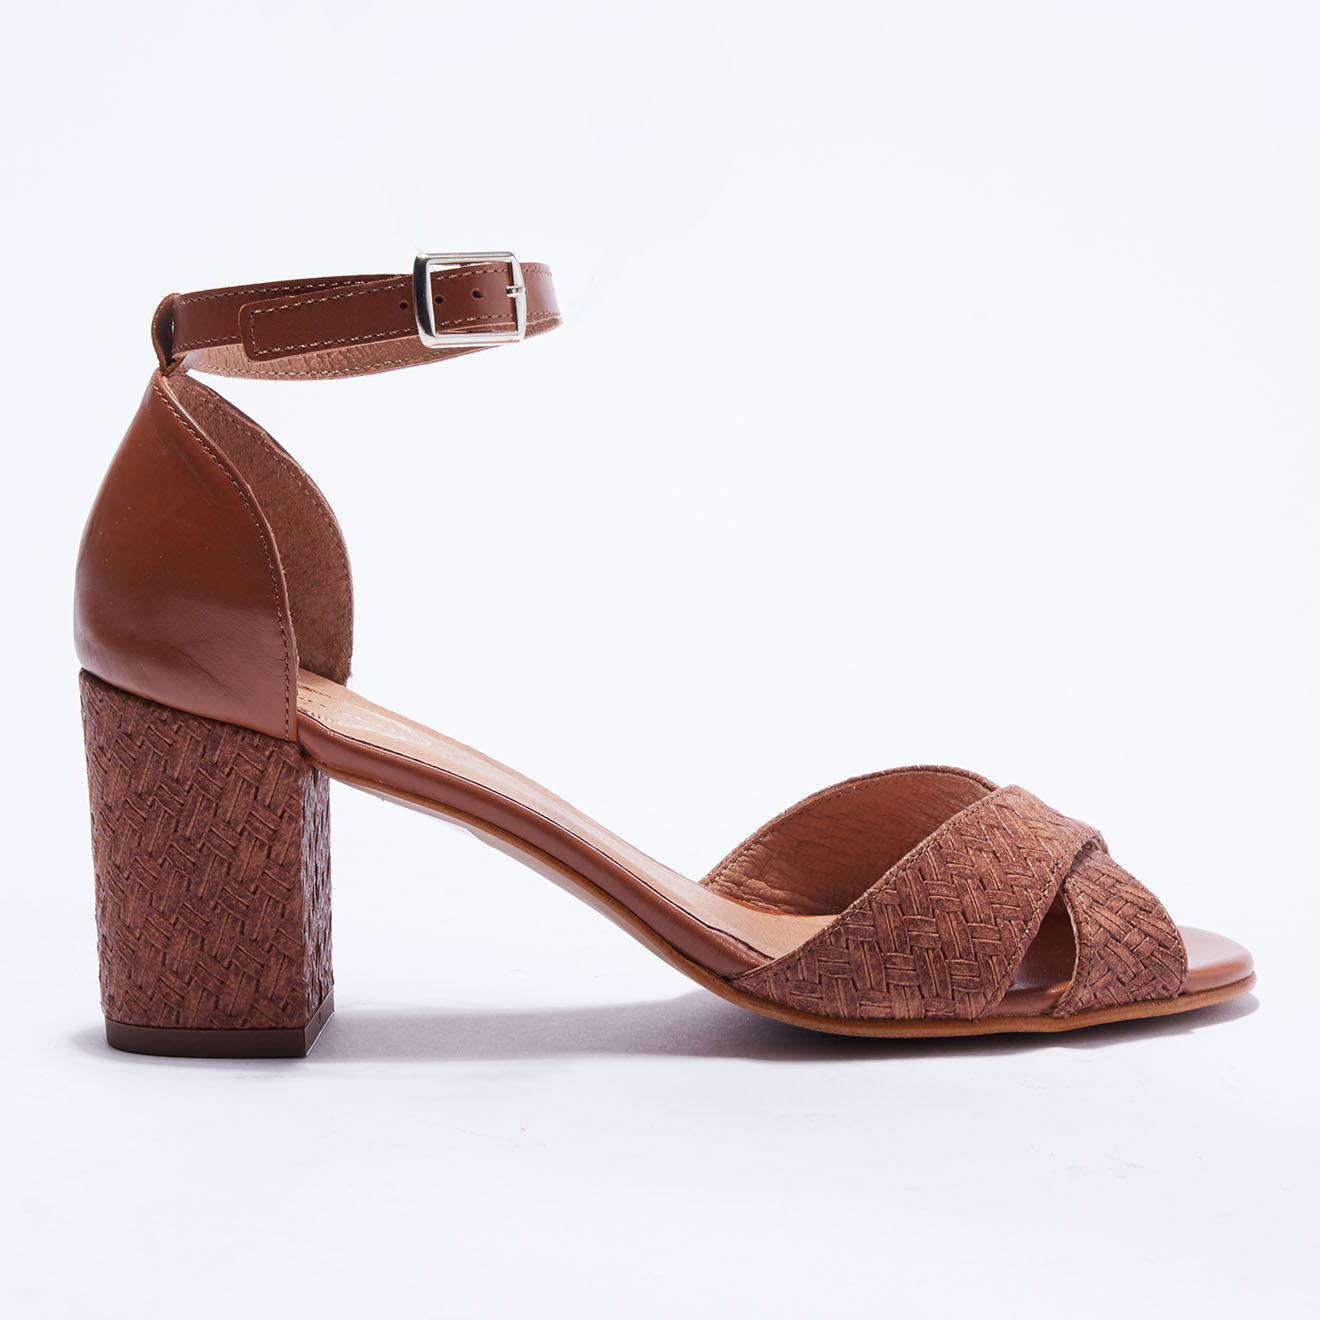 Sandales en Cuir tressé cognac - Talon 7 cm - Apologie - Modalova